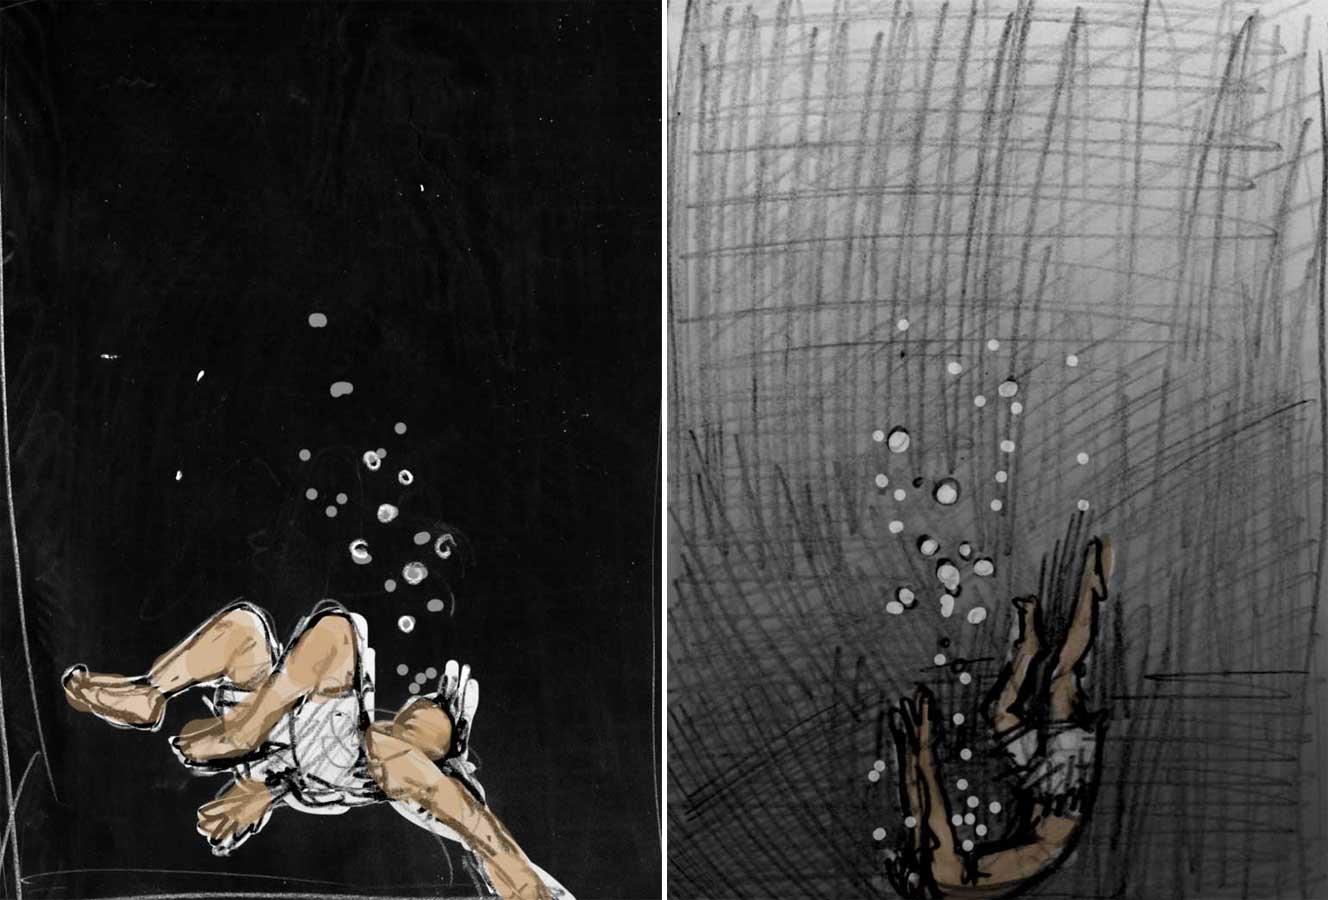 Yuko Shimizu - Men's Health read before you dive in -